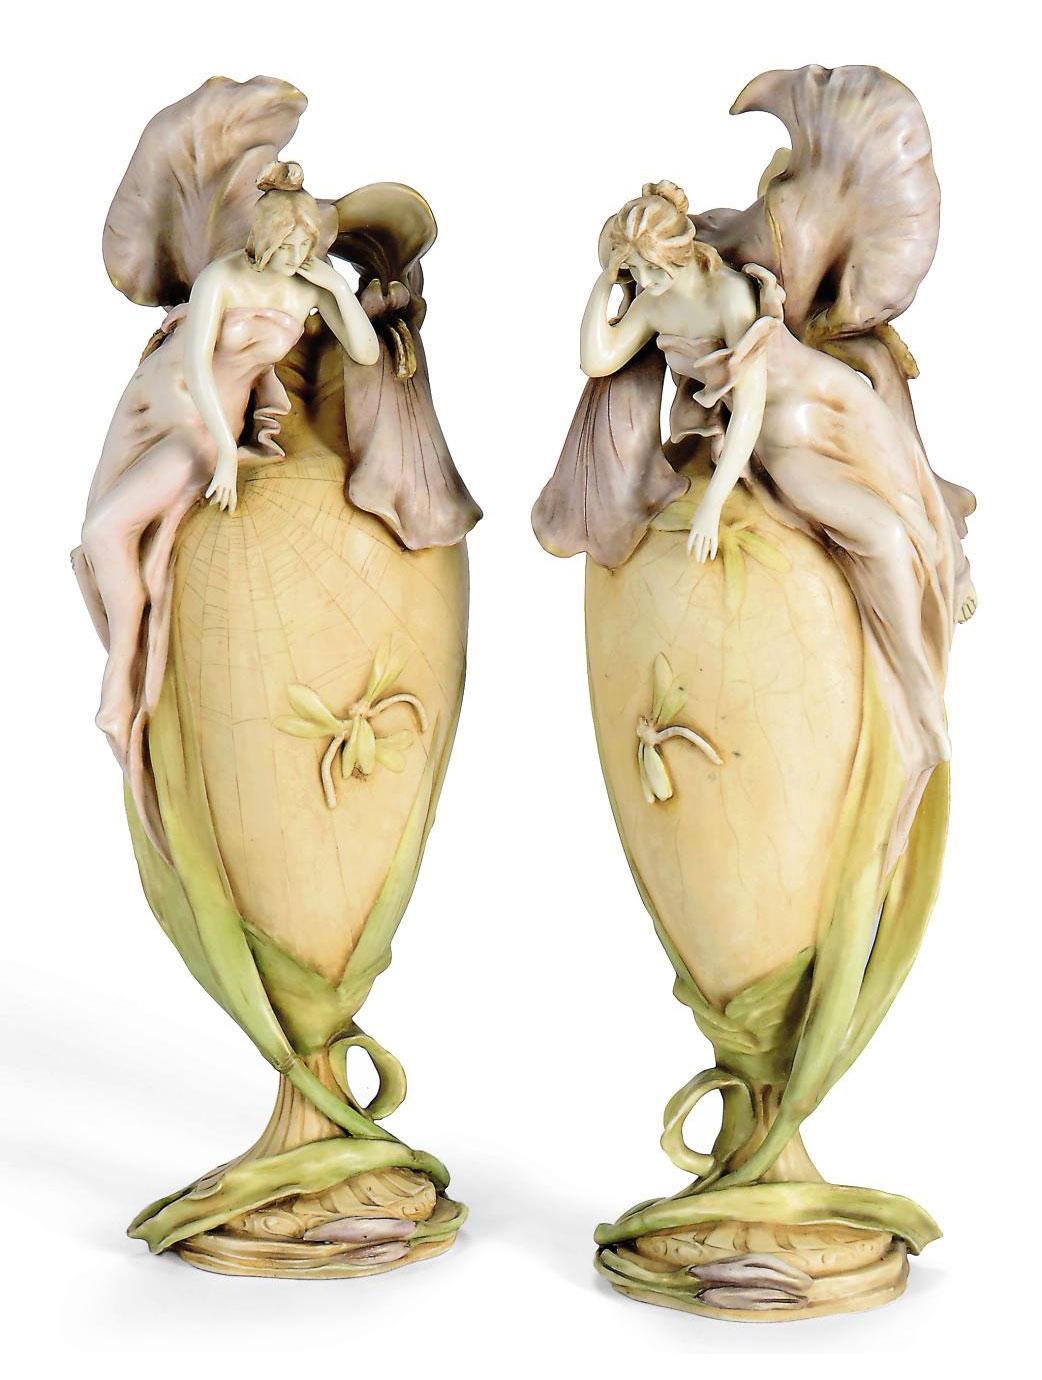 A Pair Of Amphora Art Nouveau Figural Ceramic Vases Circa 1900 Christie S